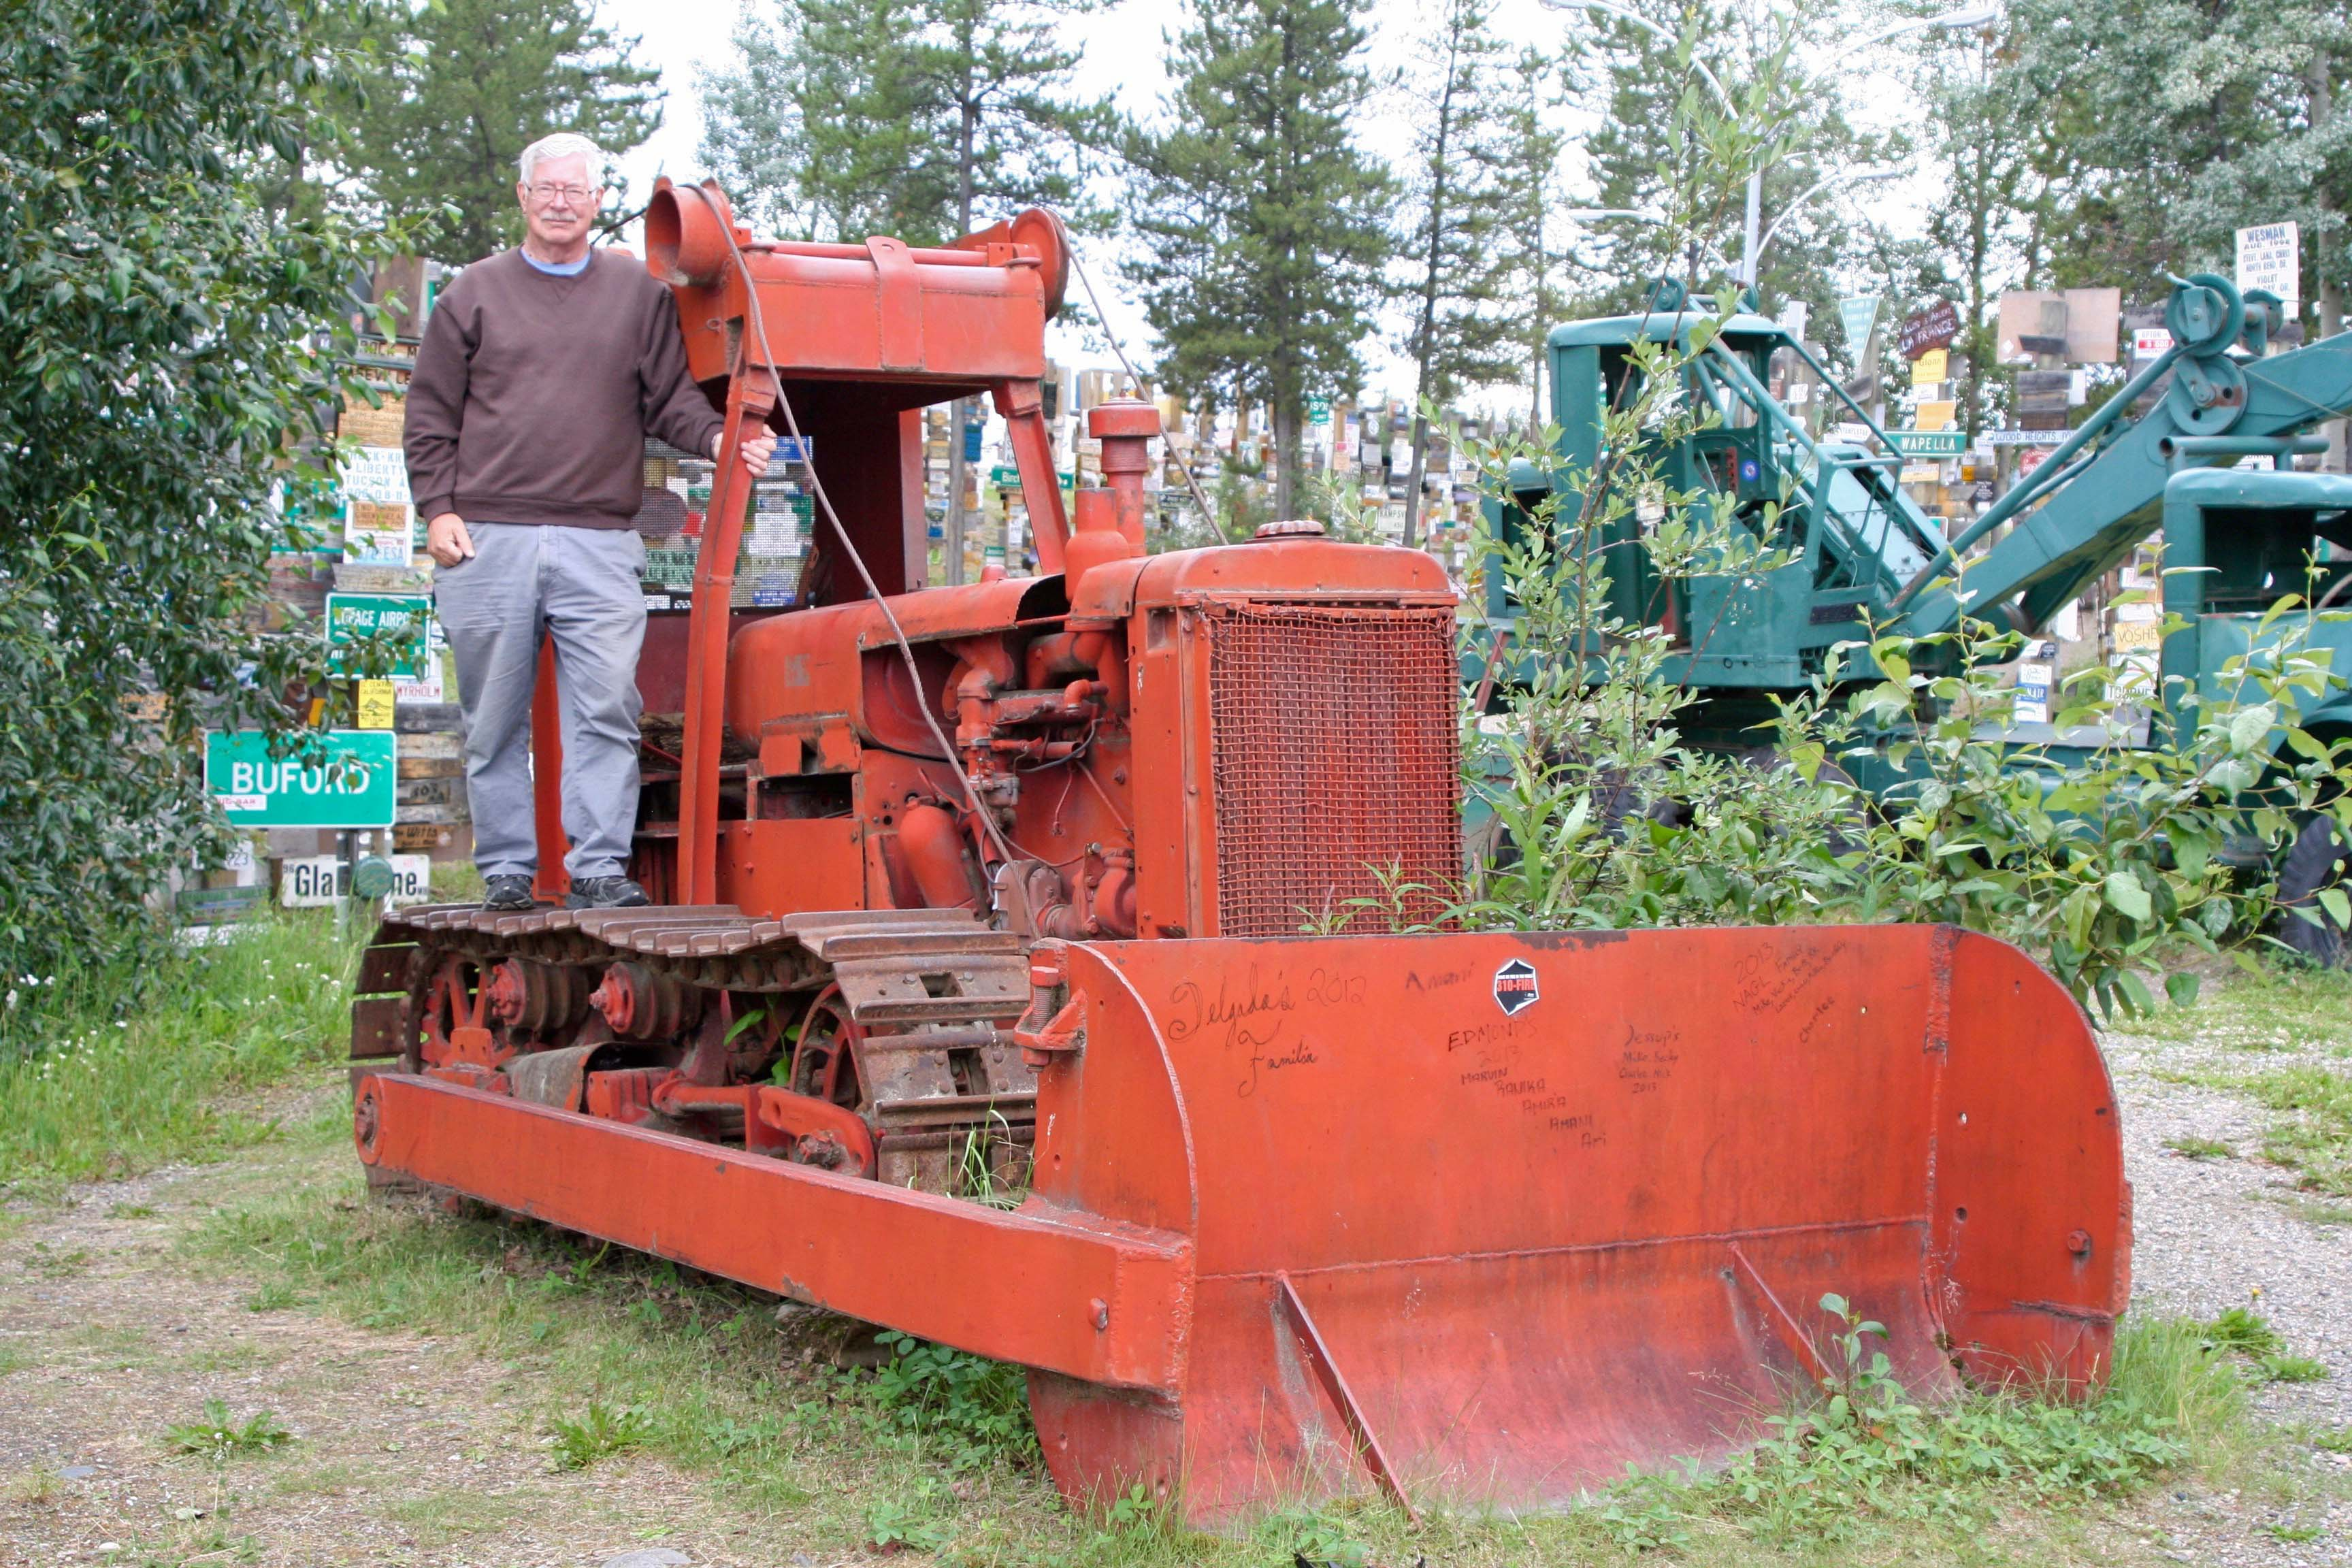 Curt Mekemson standing on bulldozer used to build Alaska Highway